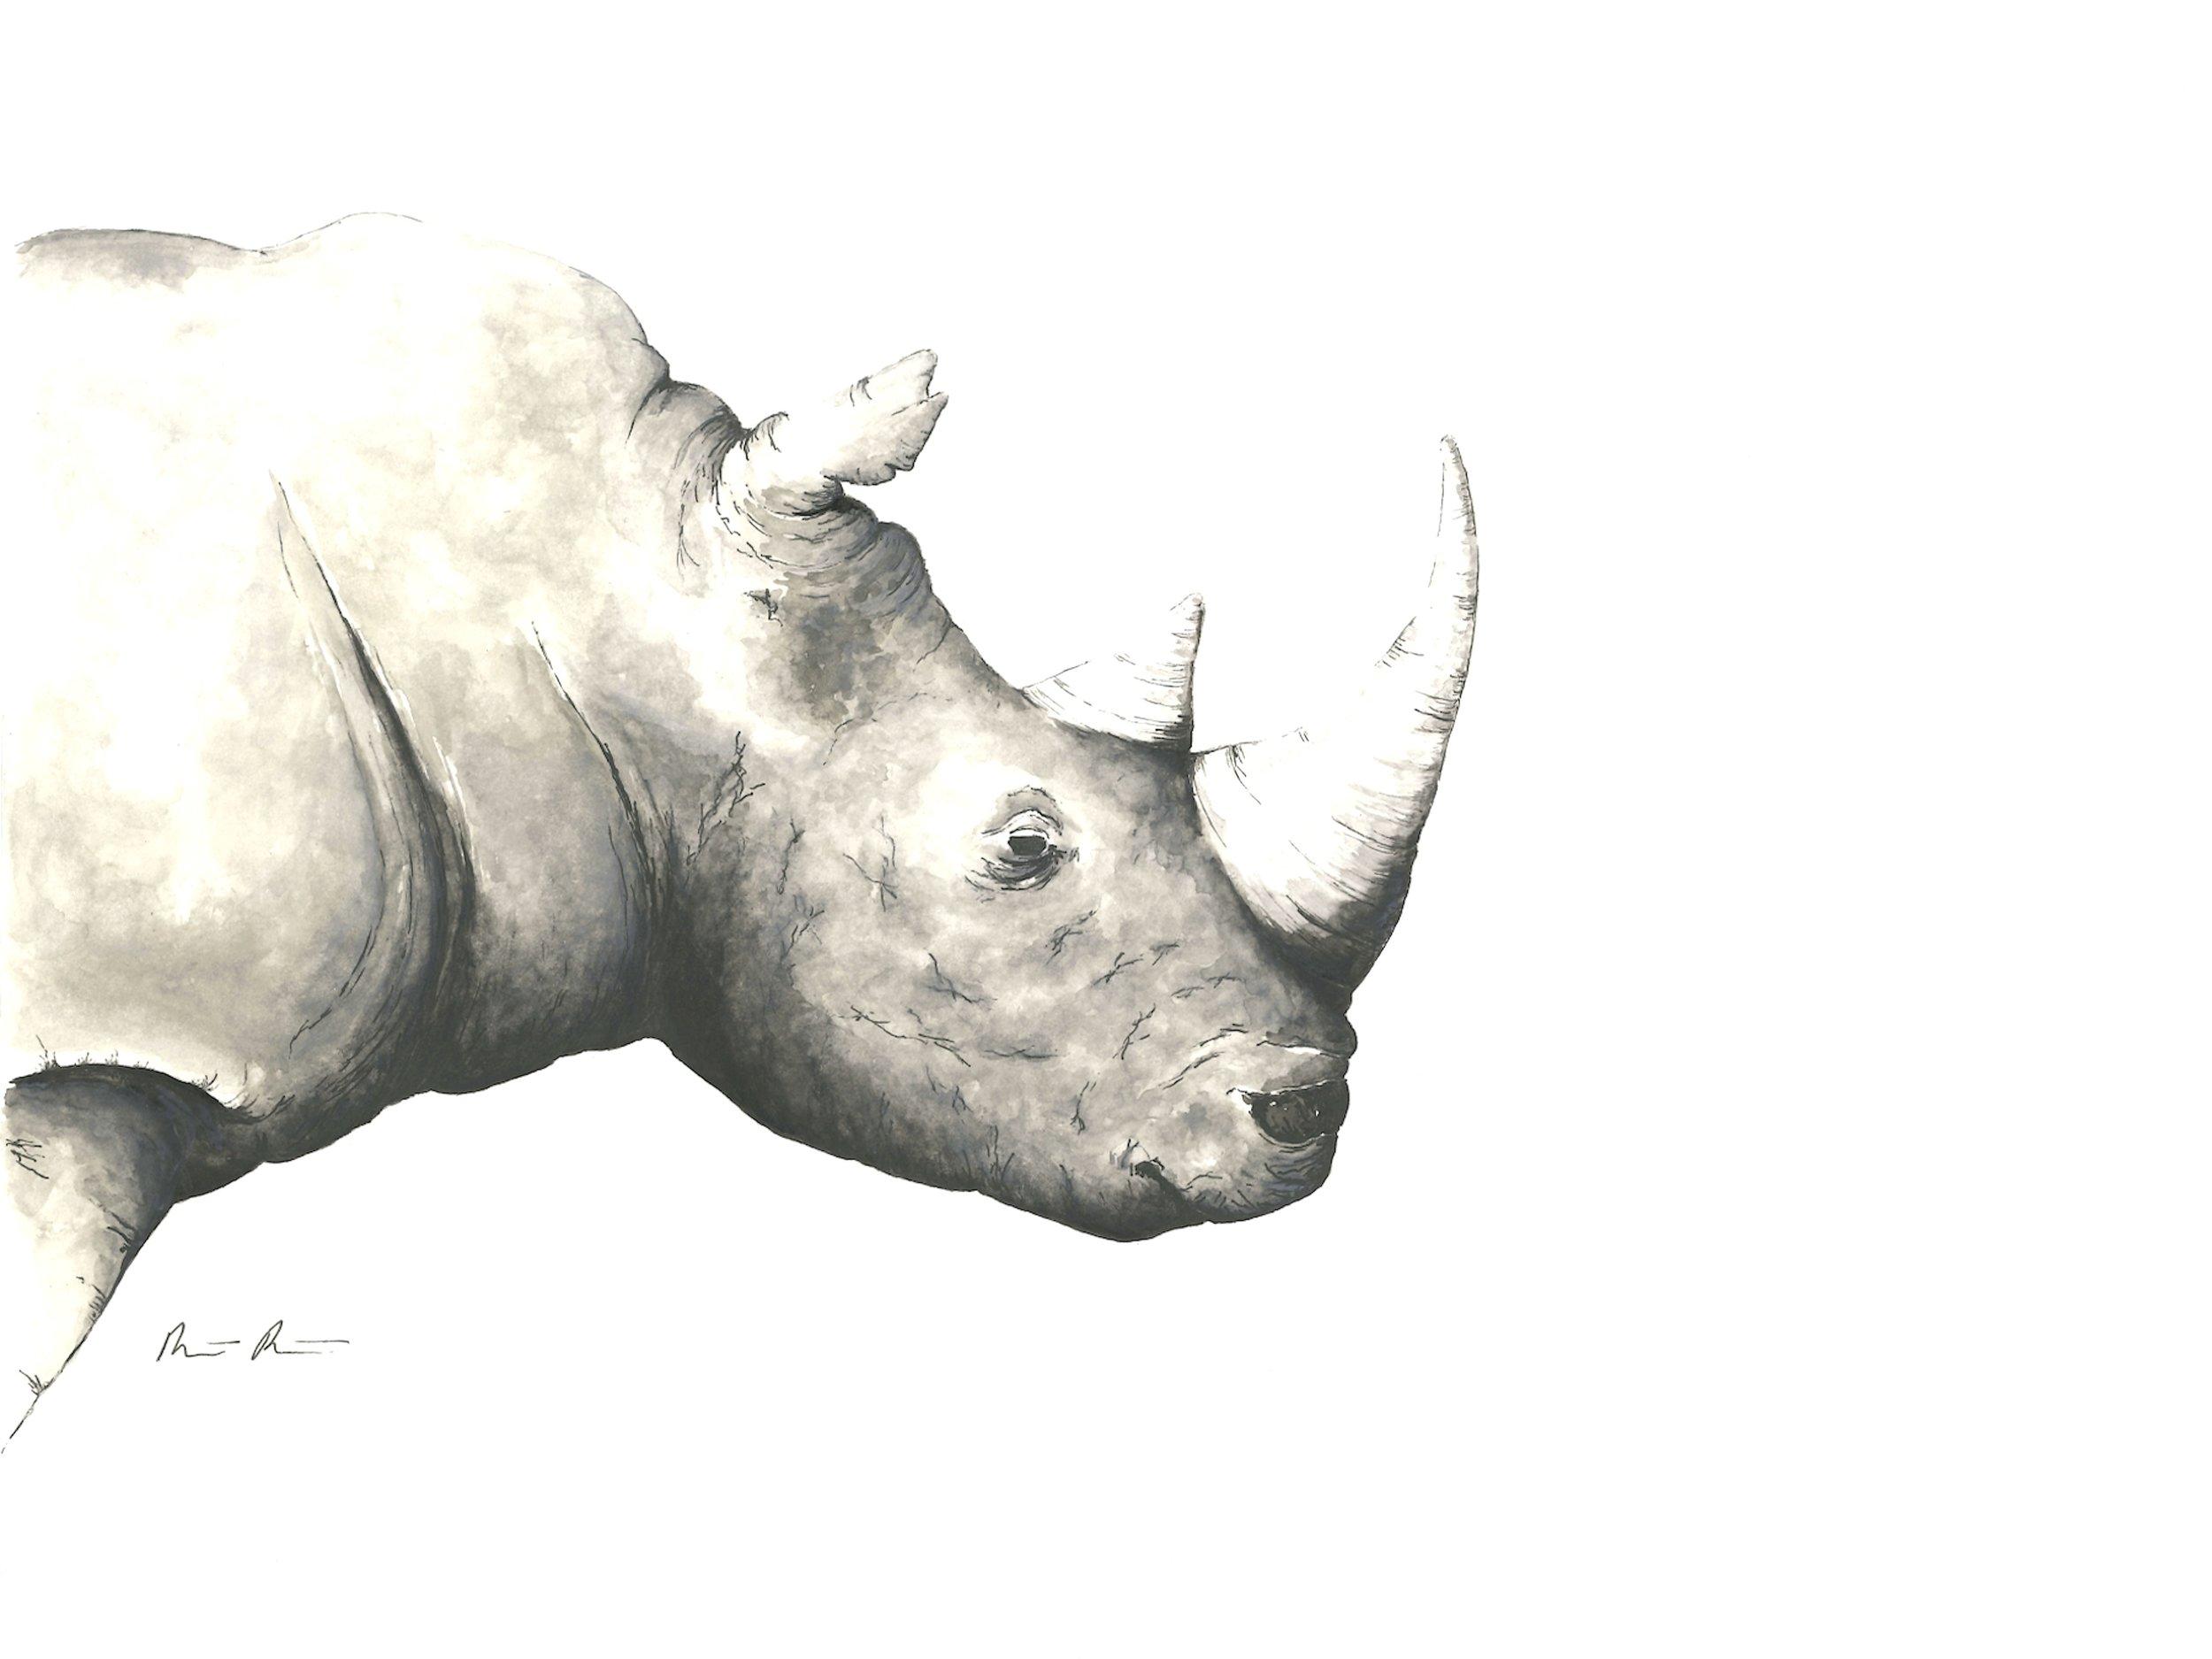 Rhino - 12